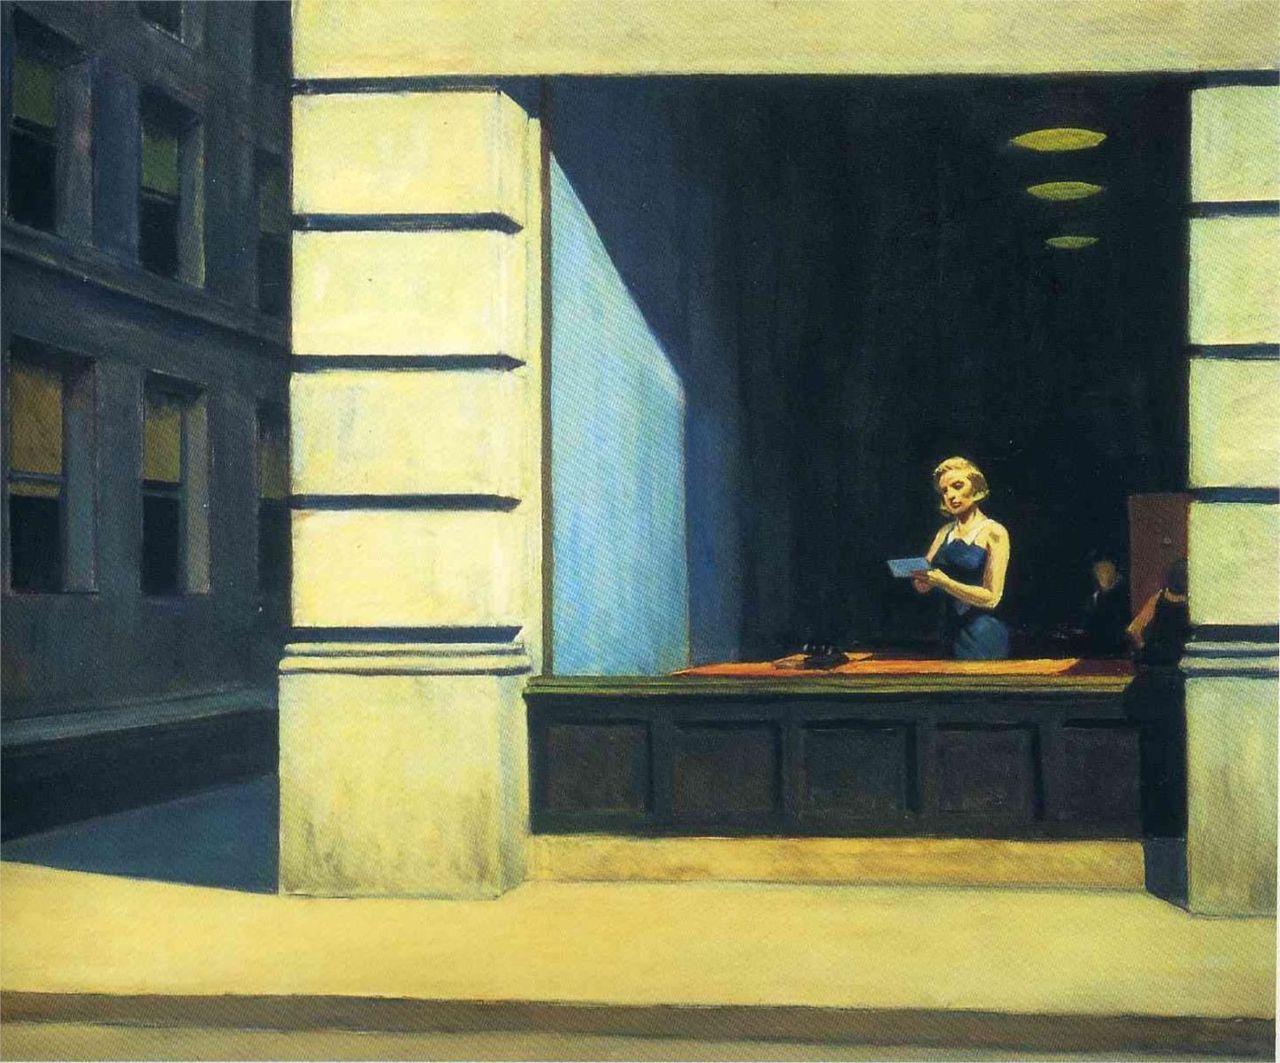 art-centric: New York Office - Edward Hopper, 1962 | New York as ...